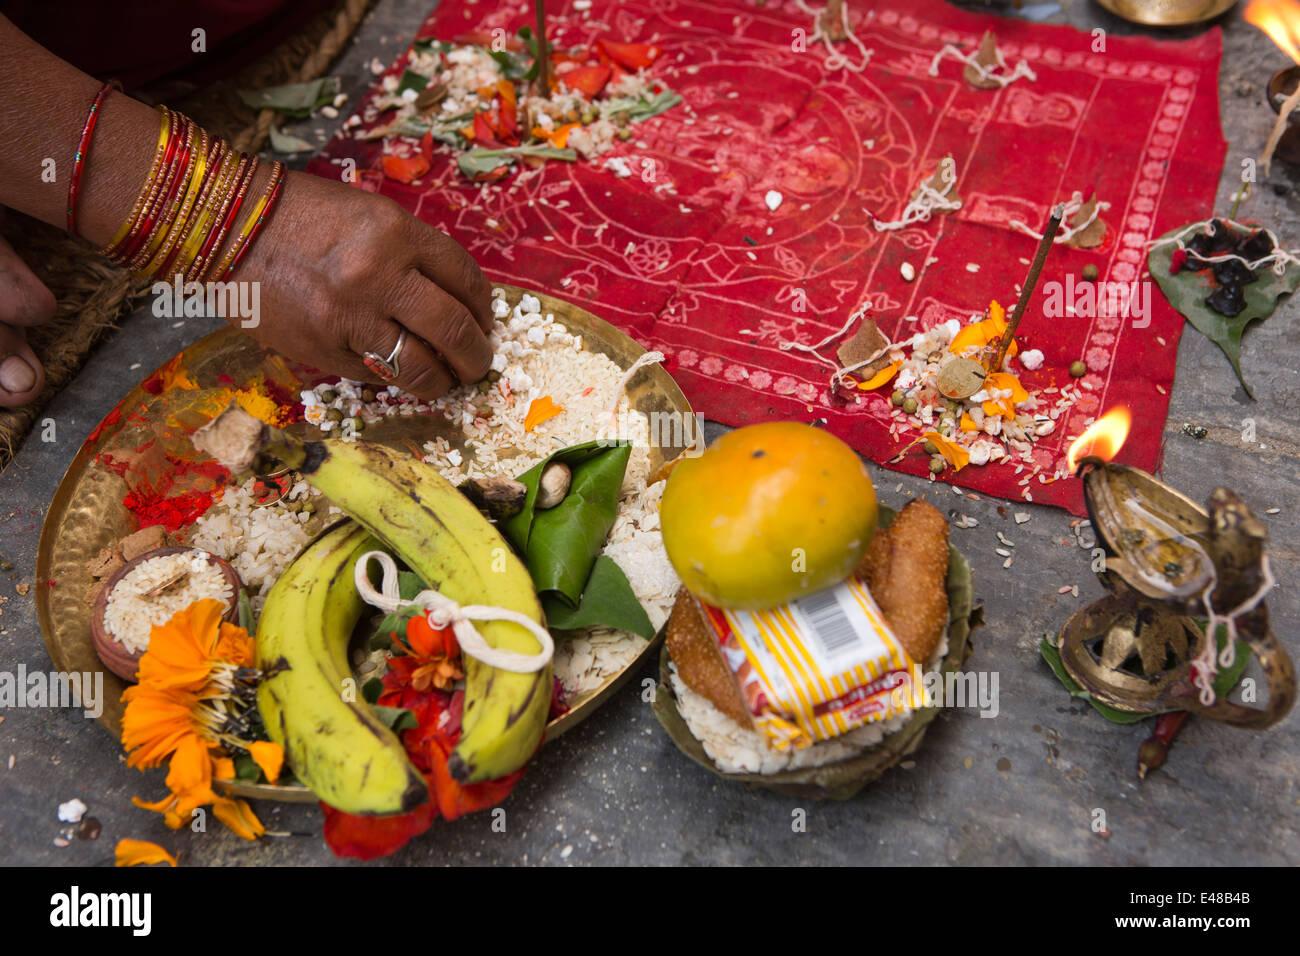 Nepal, Kathmandu, Nag Bahal, Kathesimbhu Stupa food and domestic items used in ritual Buddhist puja - Stock Image